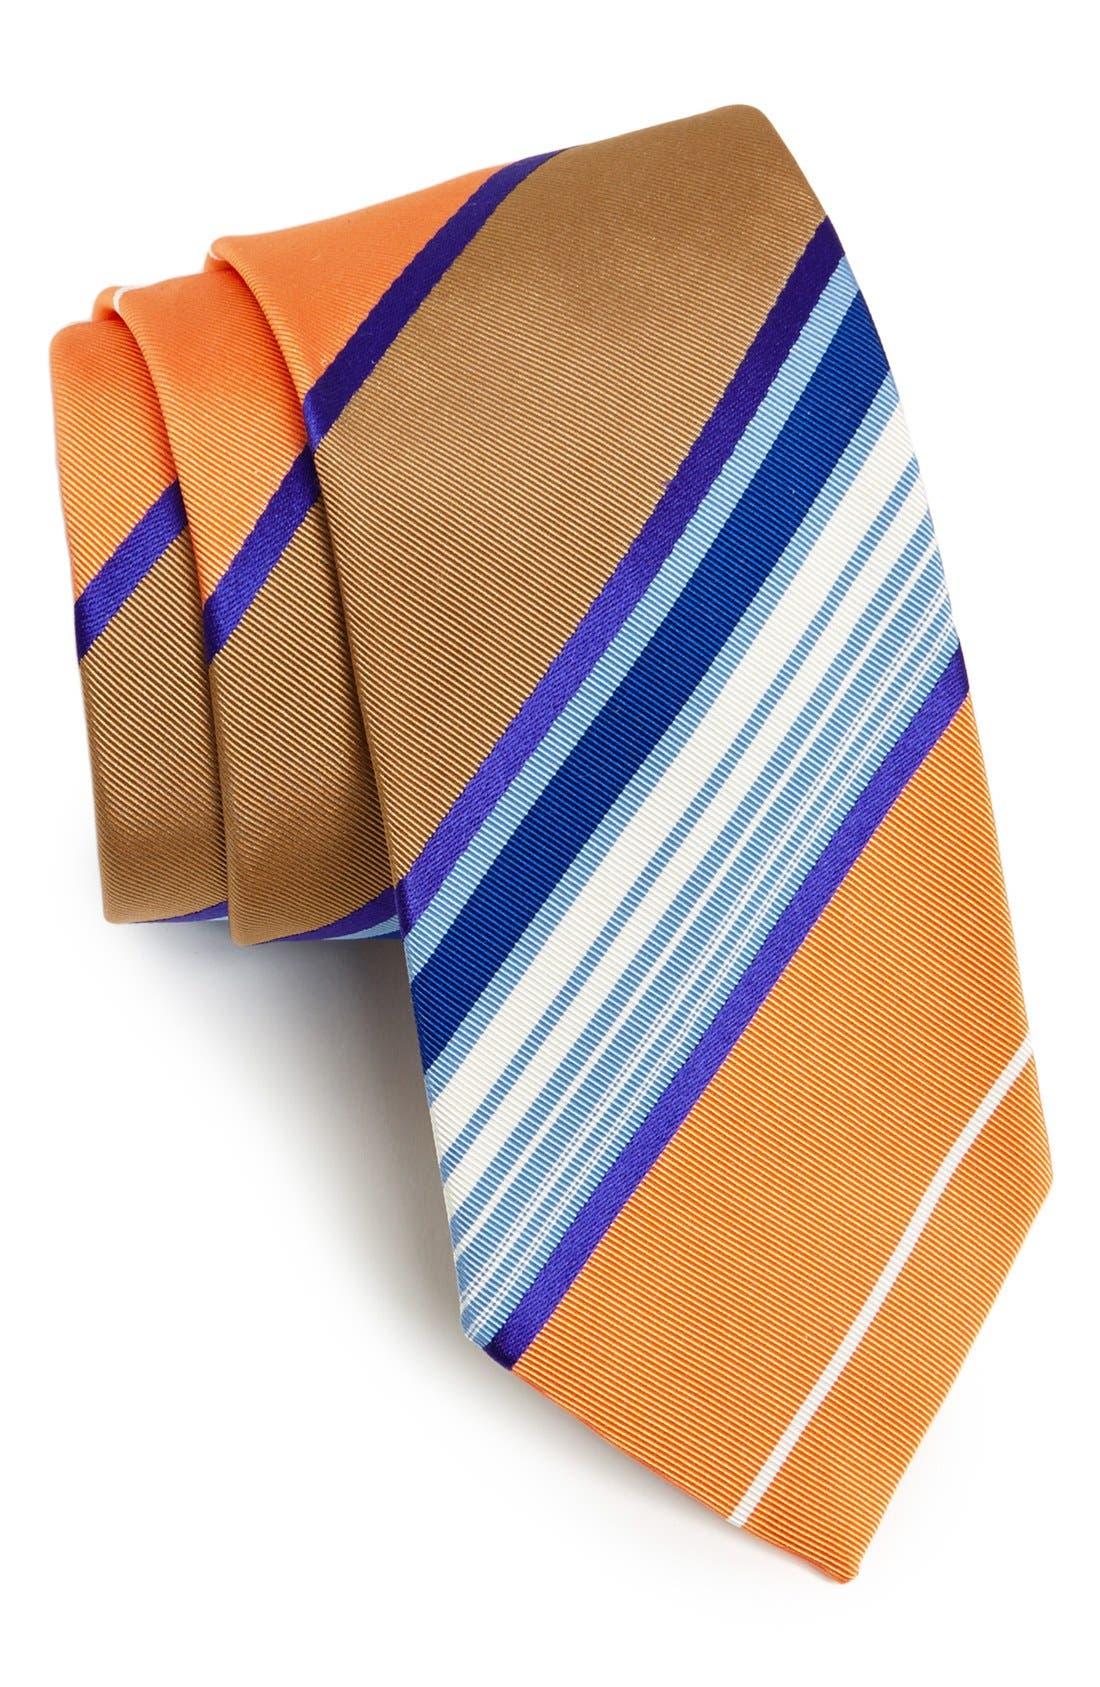 Main Image - Etro Woven Silk & Cotton Tie